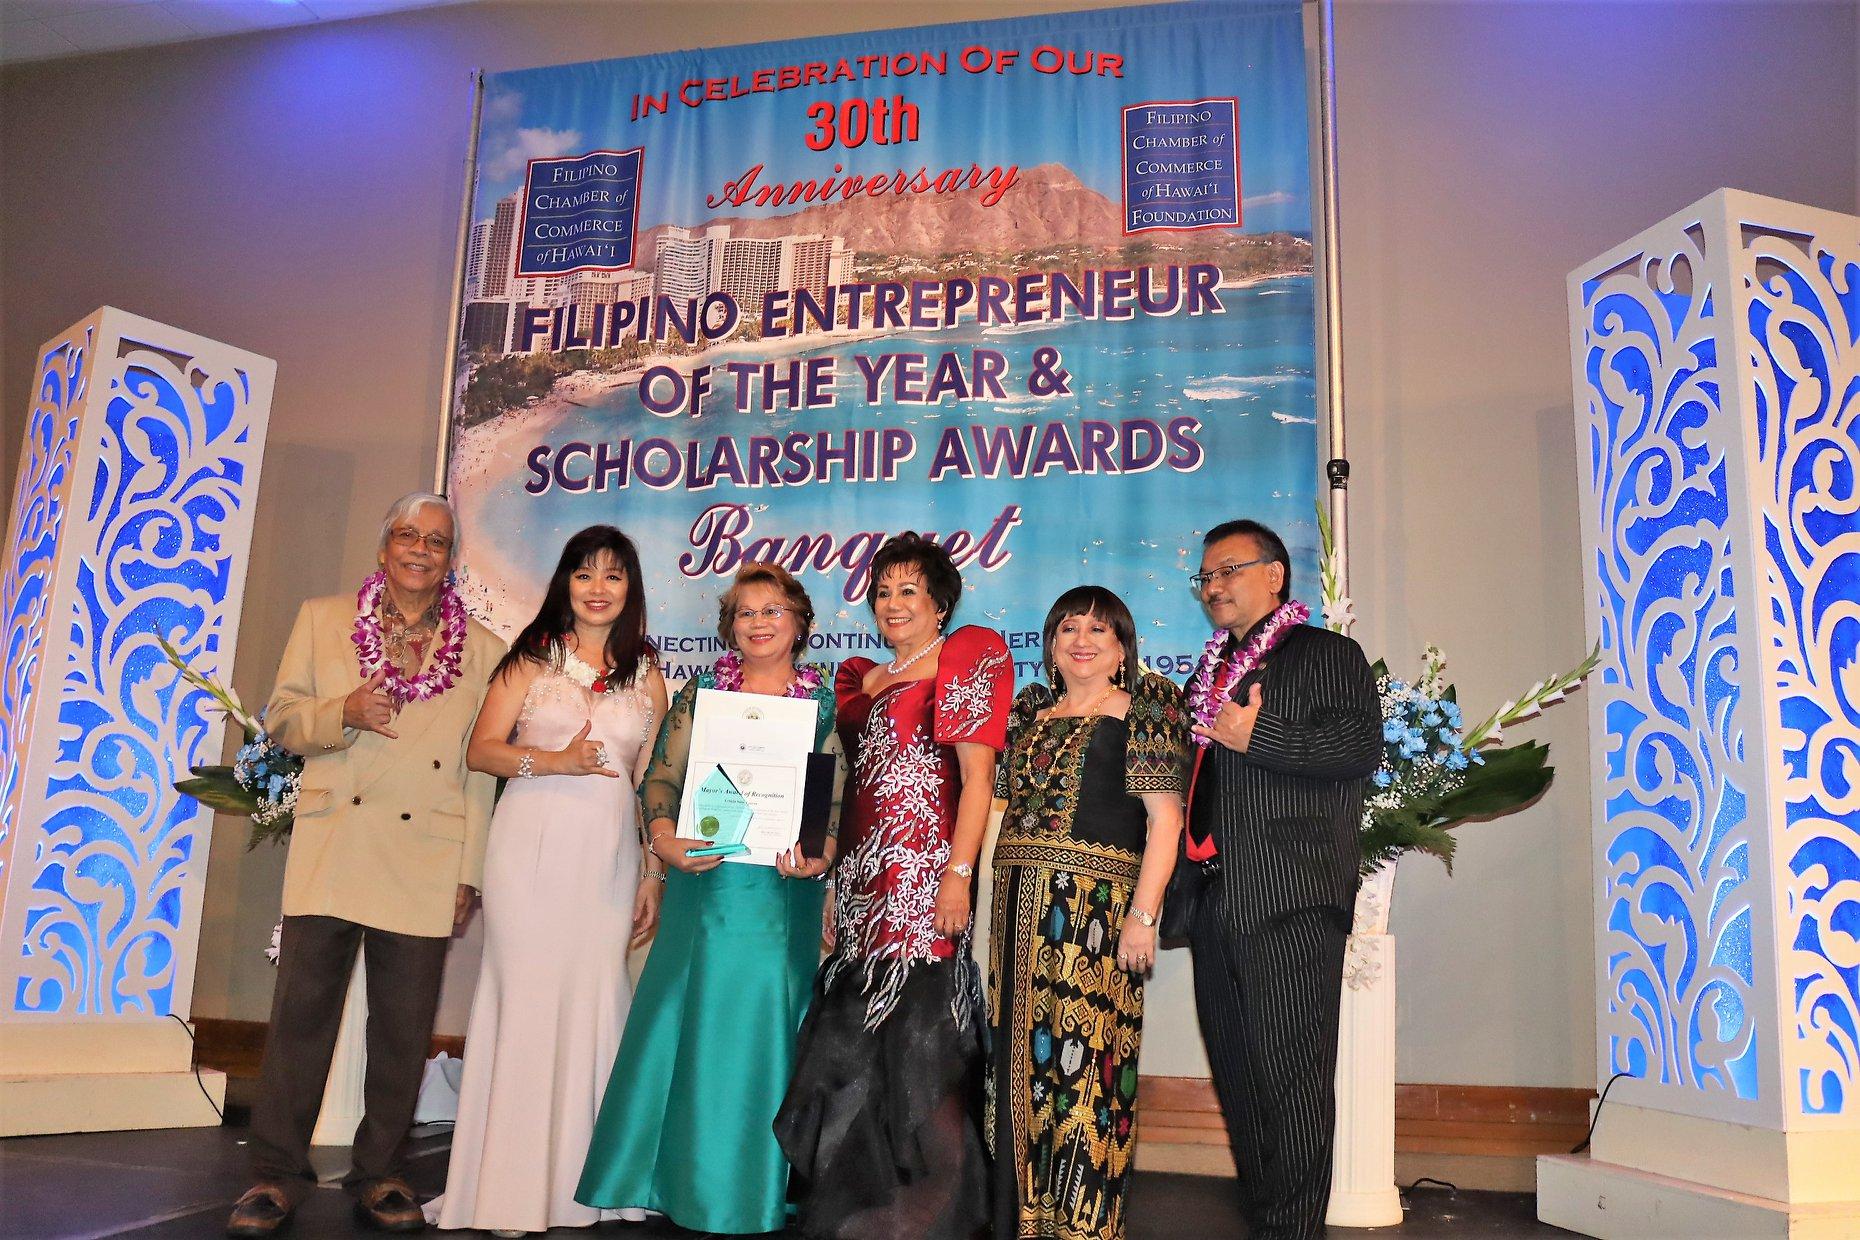 Filipino Entrepreneur of the Year